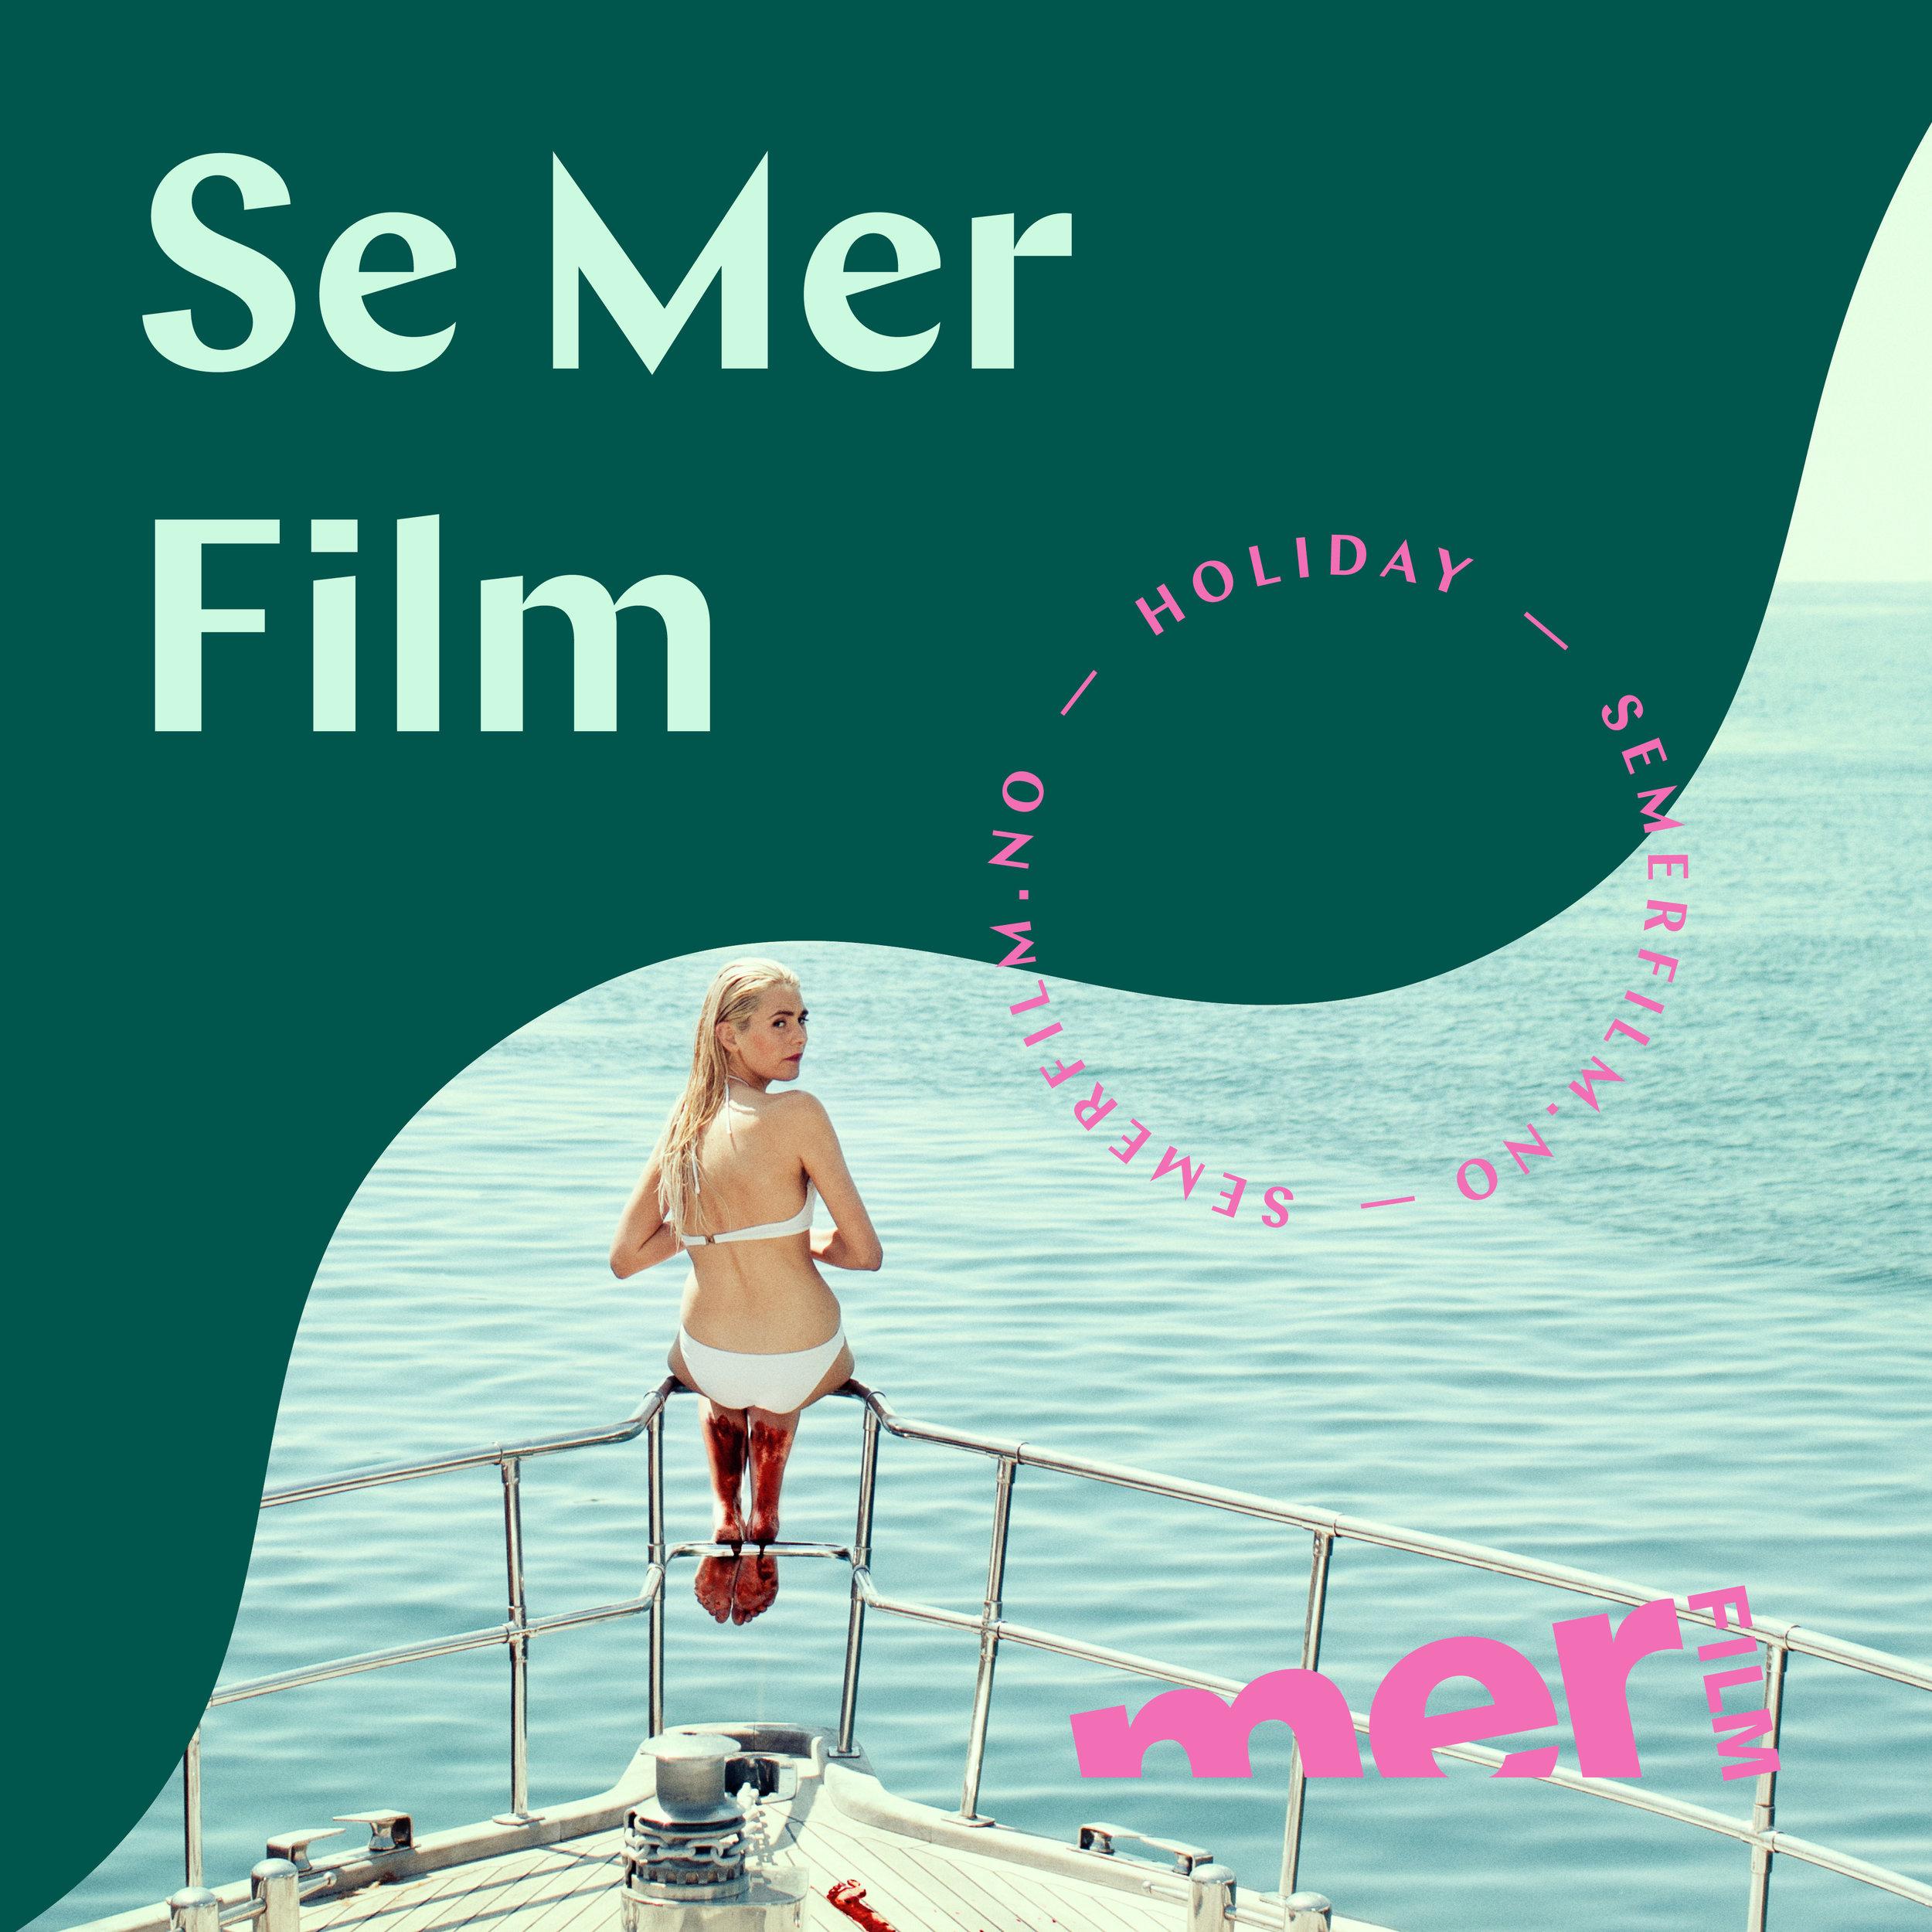 Se_Mer_film_Holiday.jpg